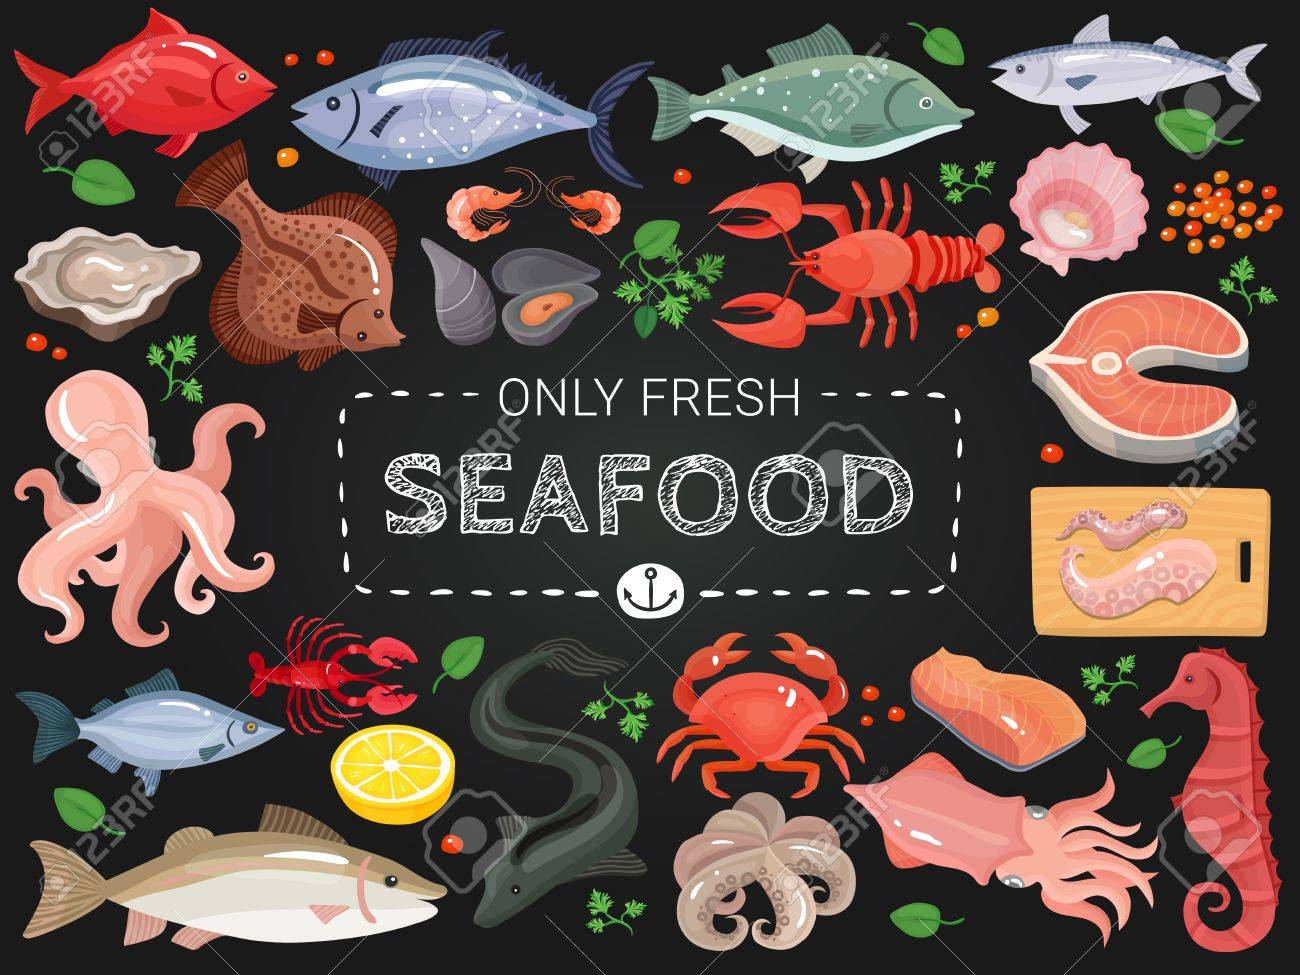 seafood restaurant menu items colorful icons on black chalkboard